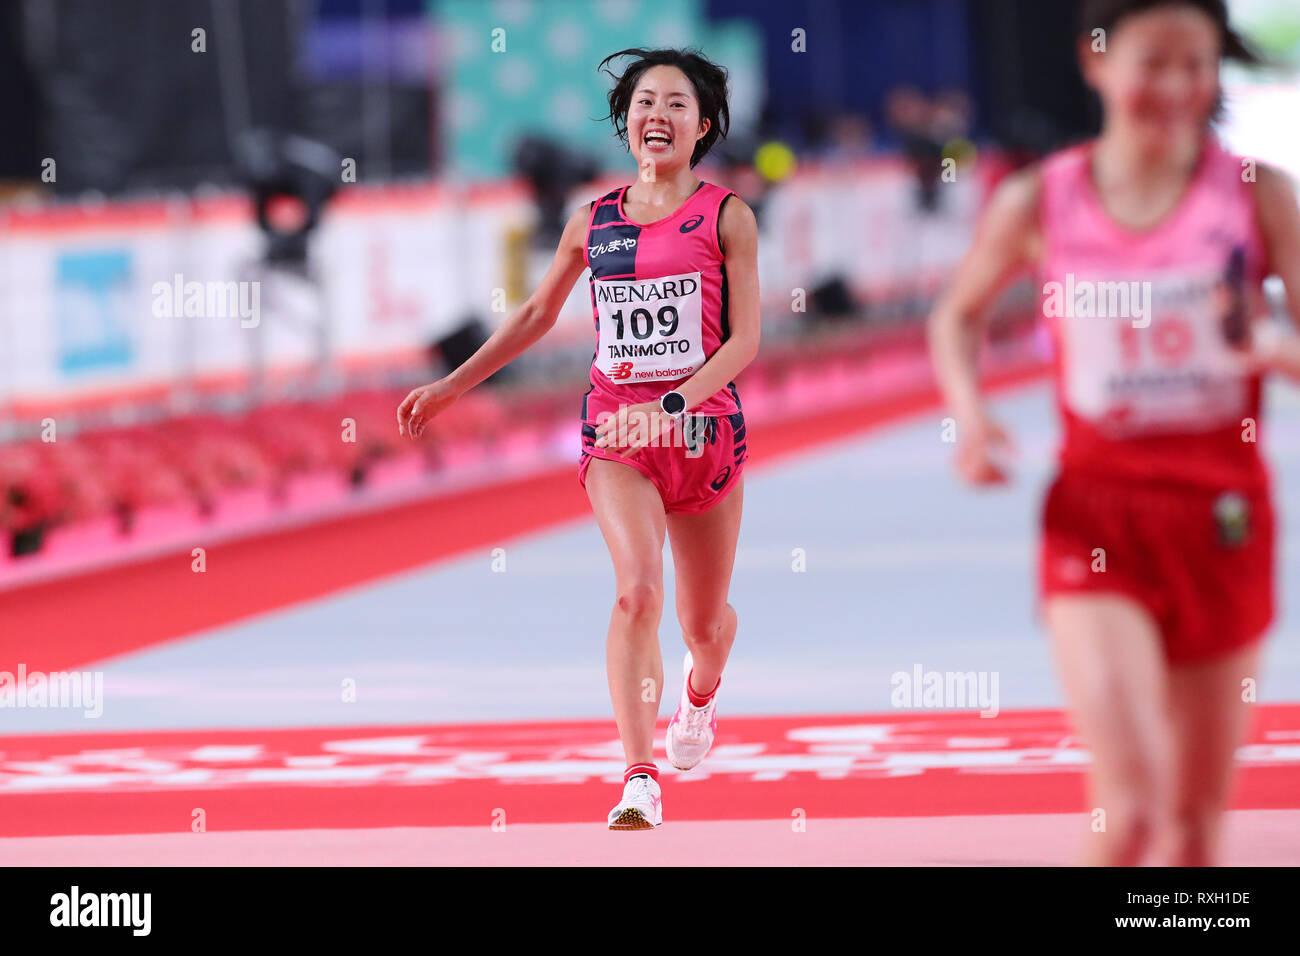 Nagoya, Aichi, Japan. 10th Mar, 2019. Mizuki Tanimoto (JPN) Marathon : Nagoya Women's Marathon 2019 in Nagoya, Aichi, Japan . Credit: YUTAKA/AFLO SPORT/Alamy Live News Stock Photo